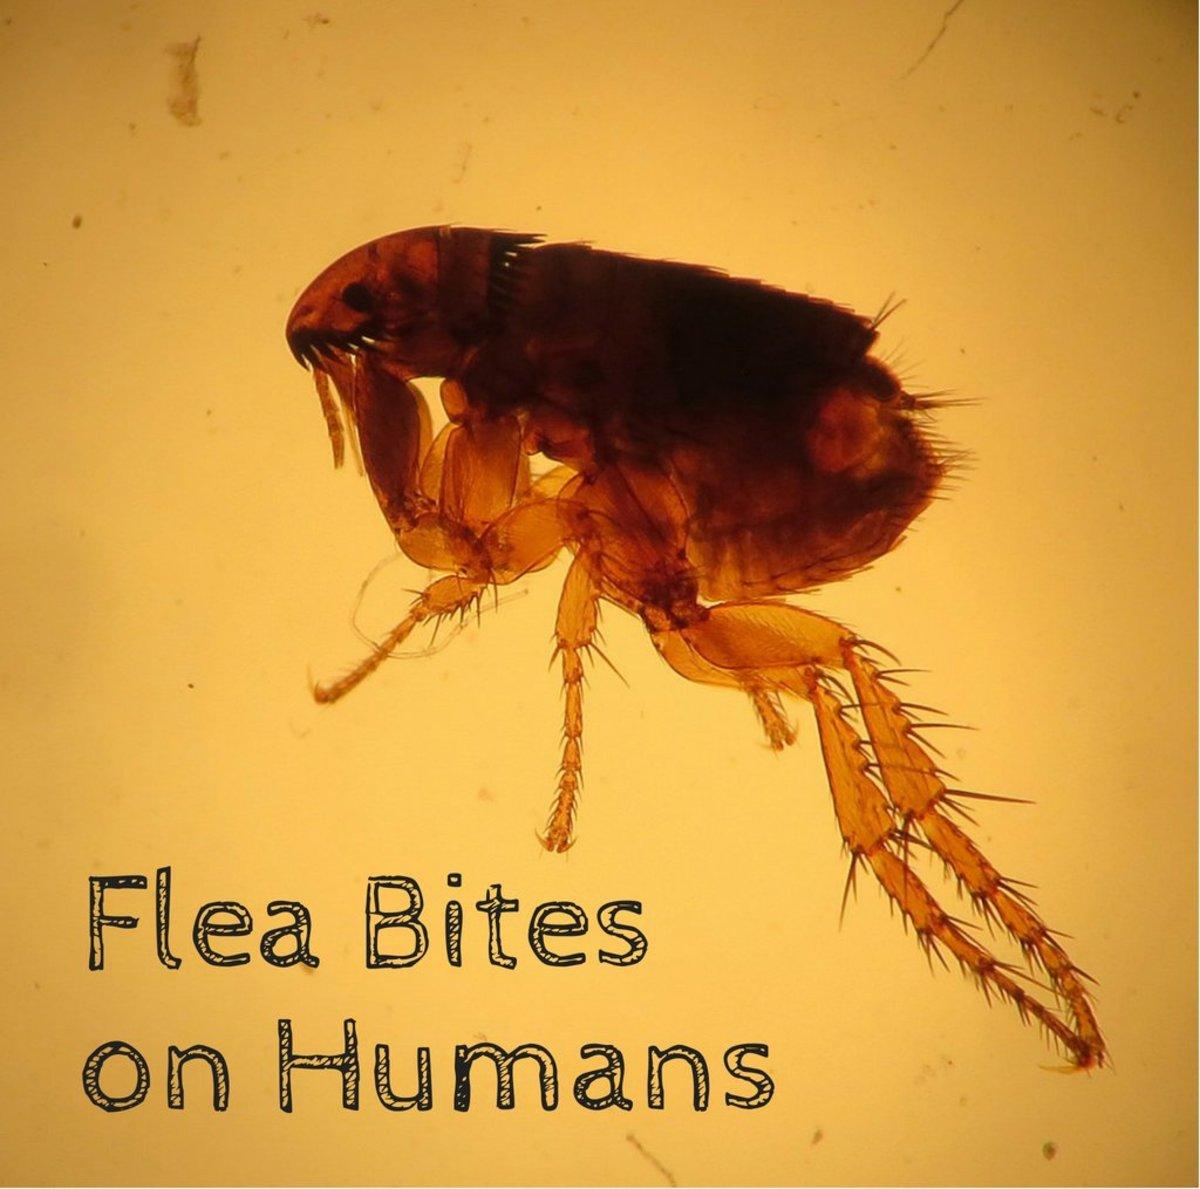 fleas bites on human - Image By dengarden